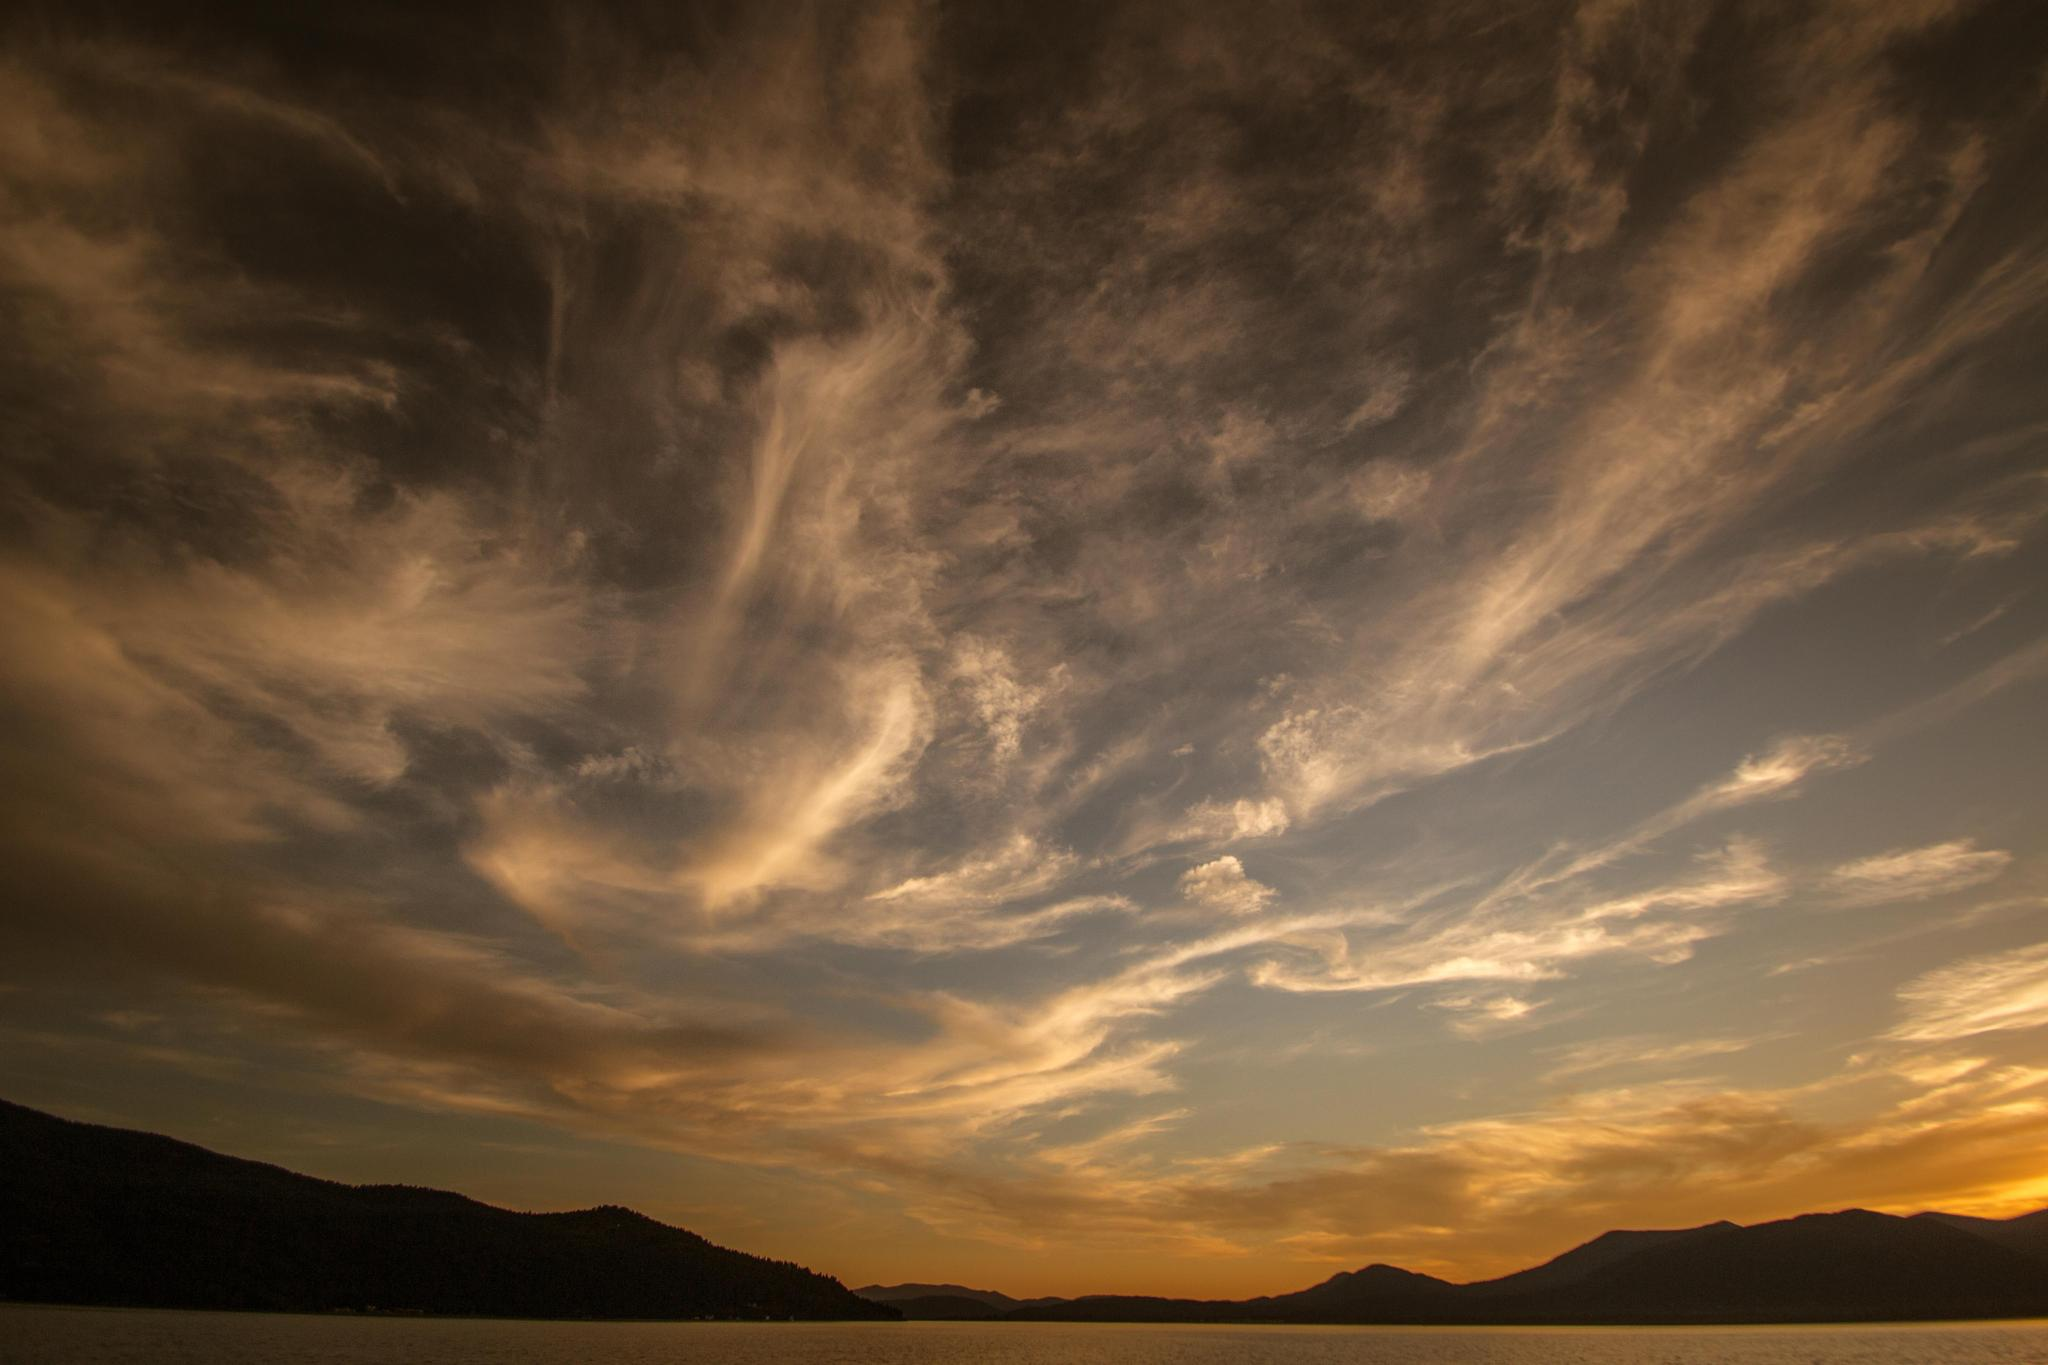 Sunset on the lake #L by Boris Droutman